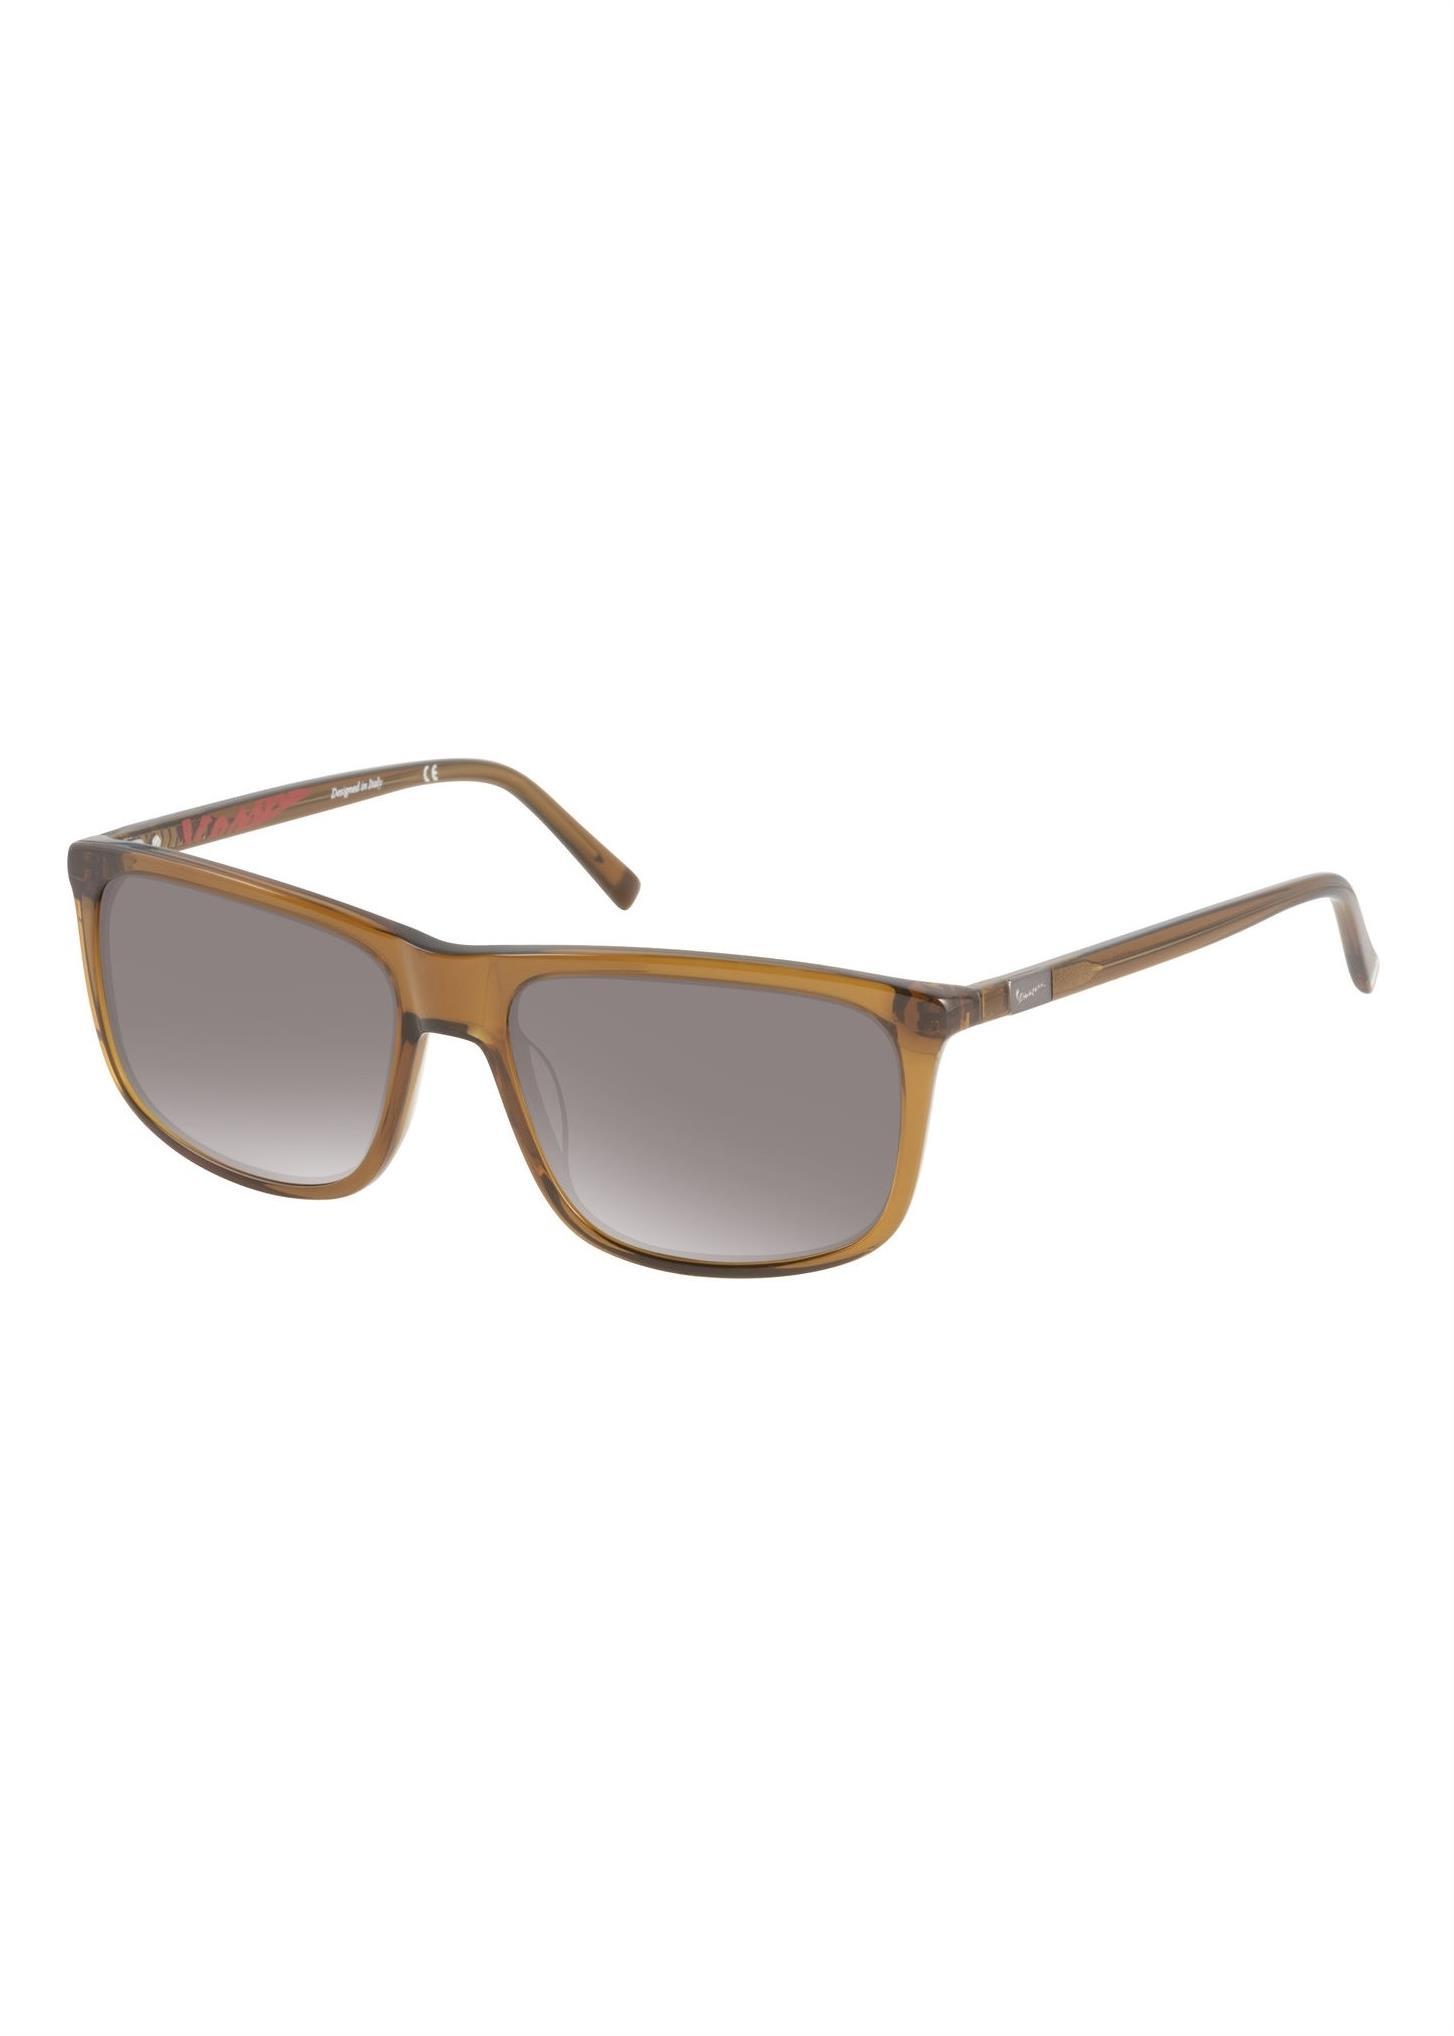 VESPA Sunglasses - VP320802